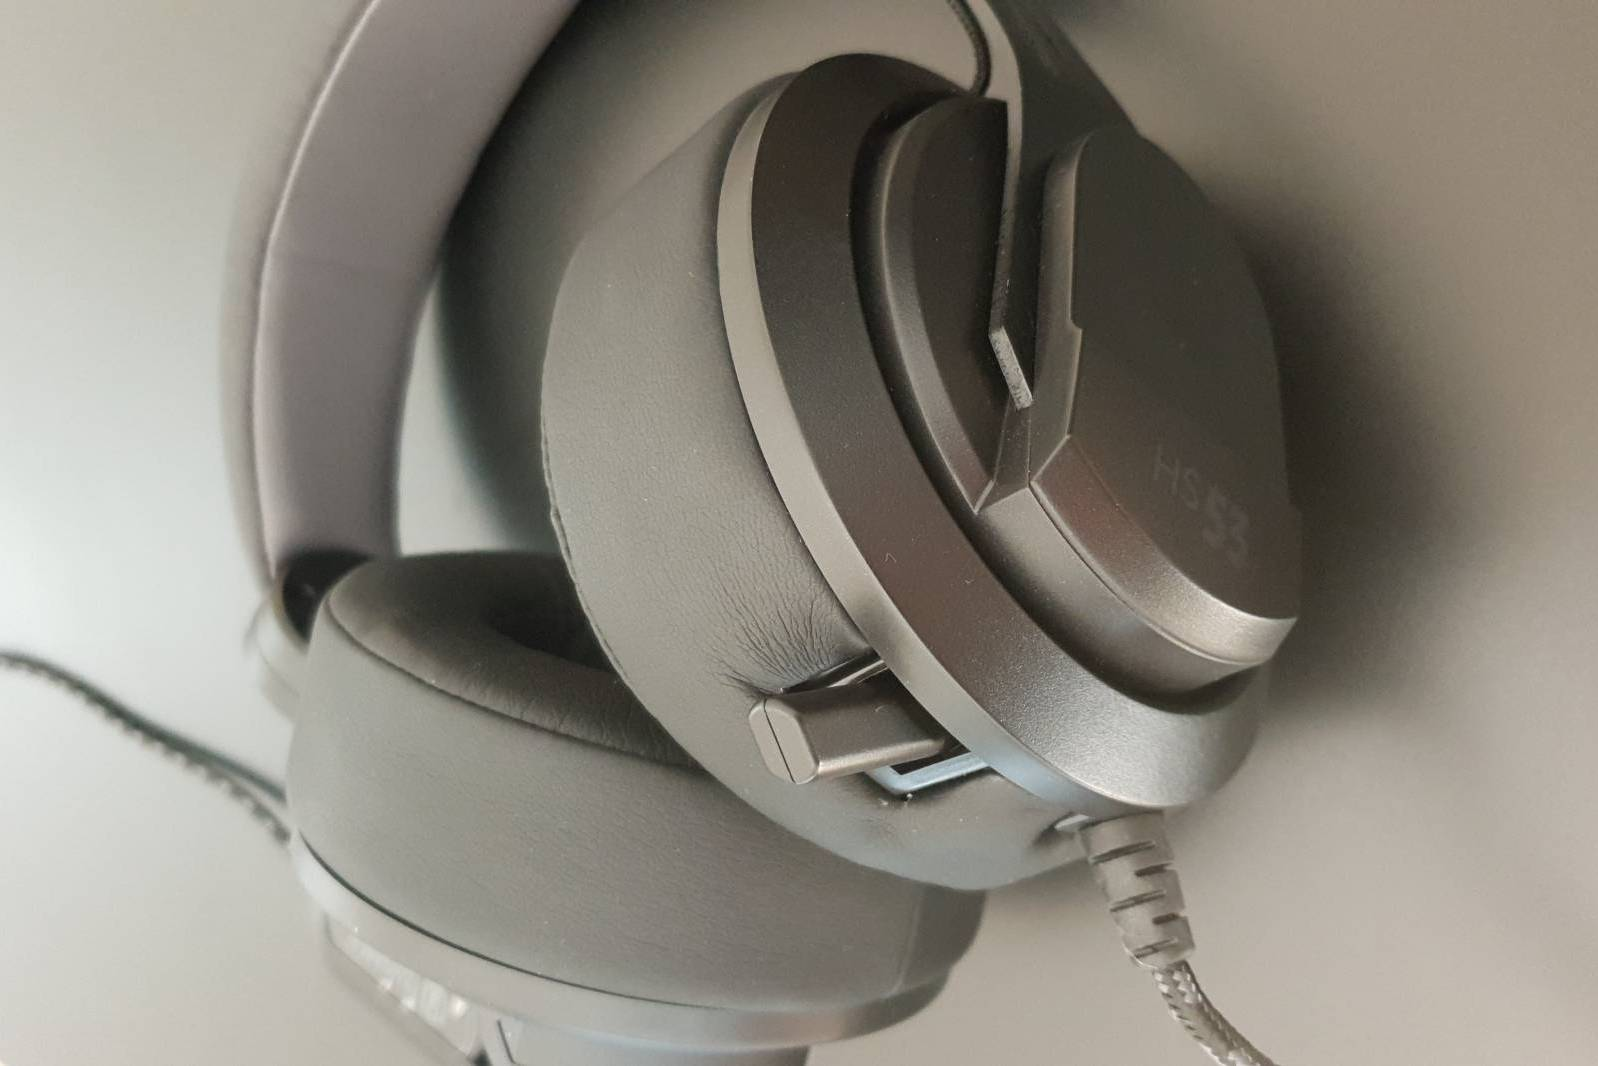 Image of my plugable onyx pc headphones